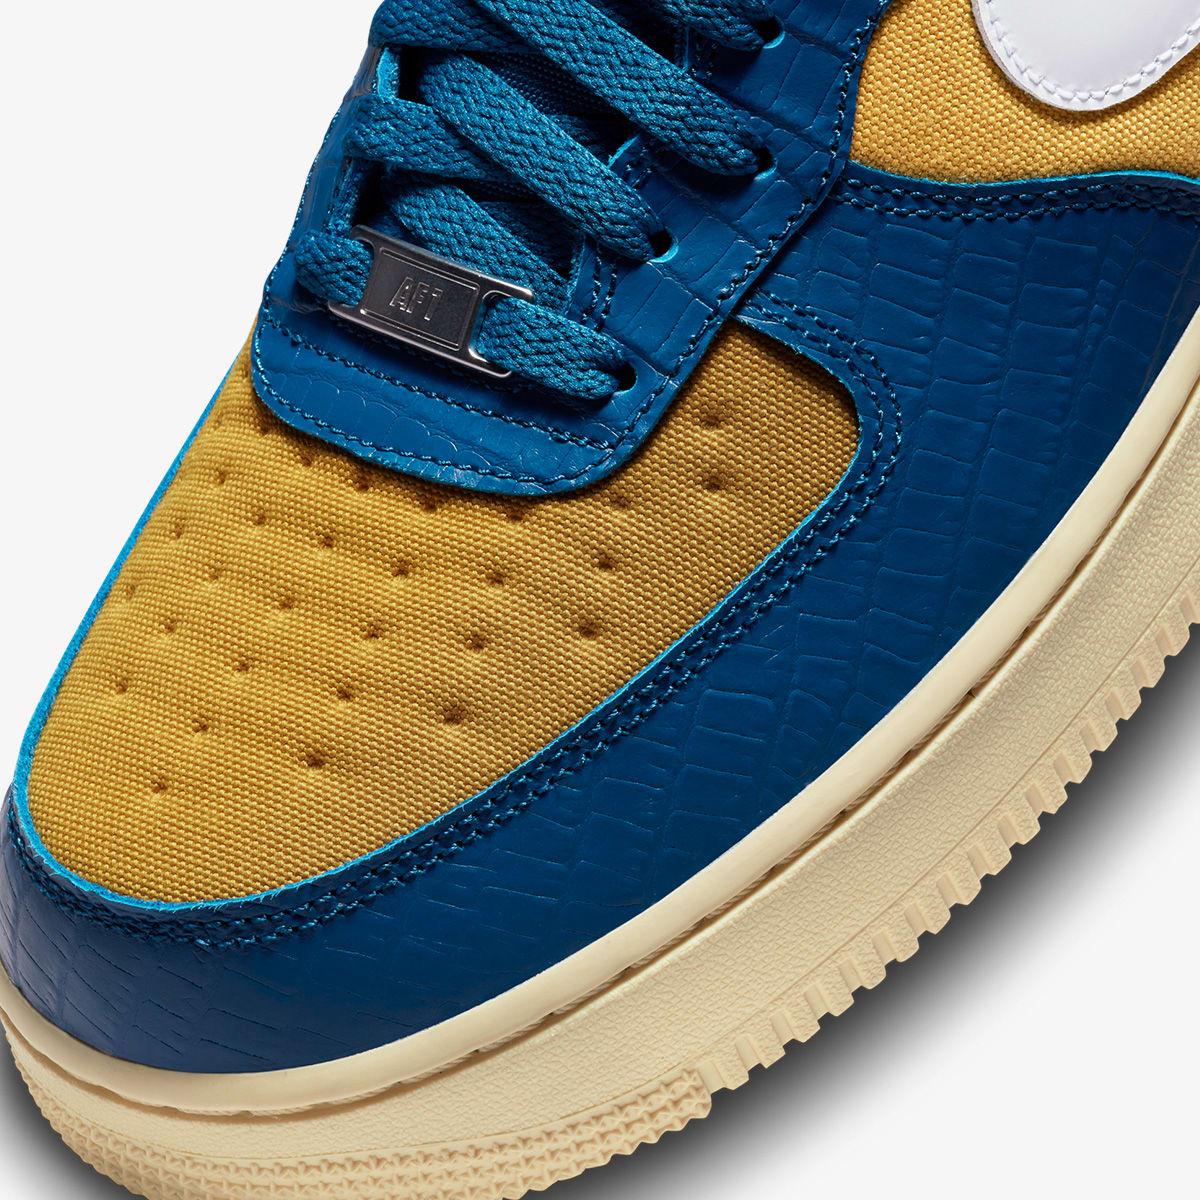 Nike Air Force 1 Low SP UNDFTD - DM8462-400